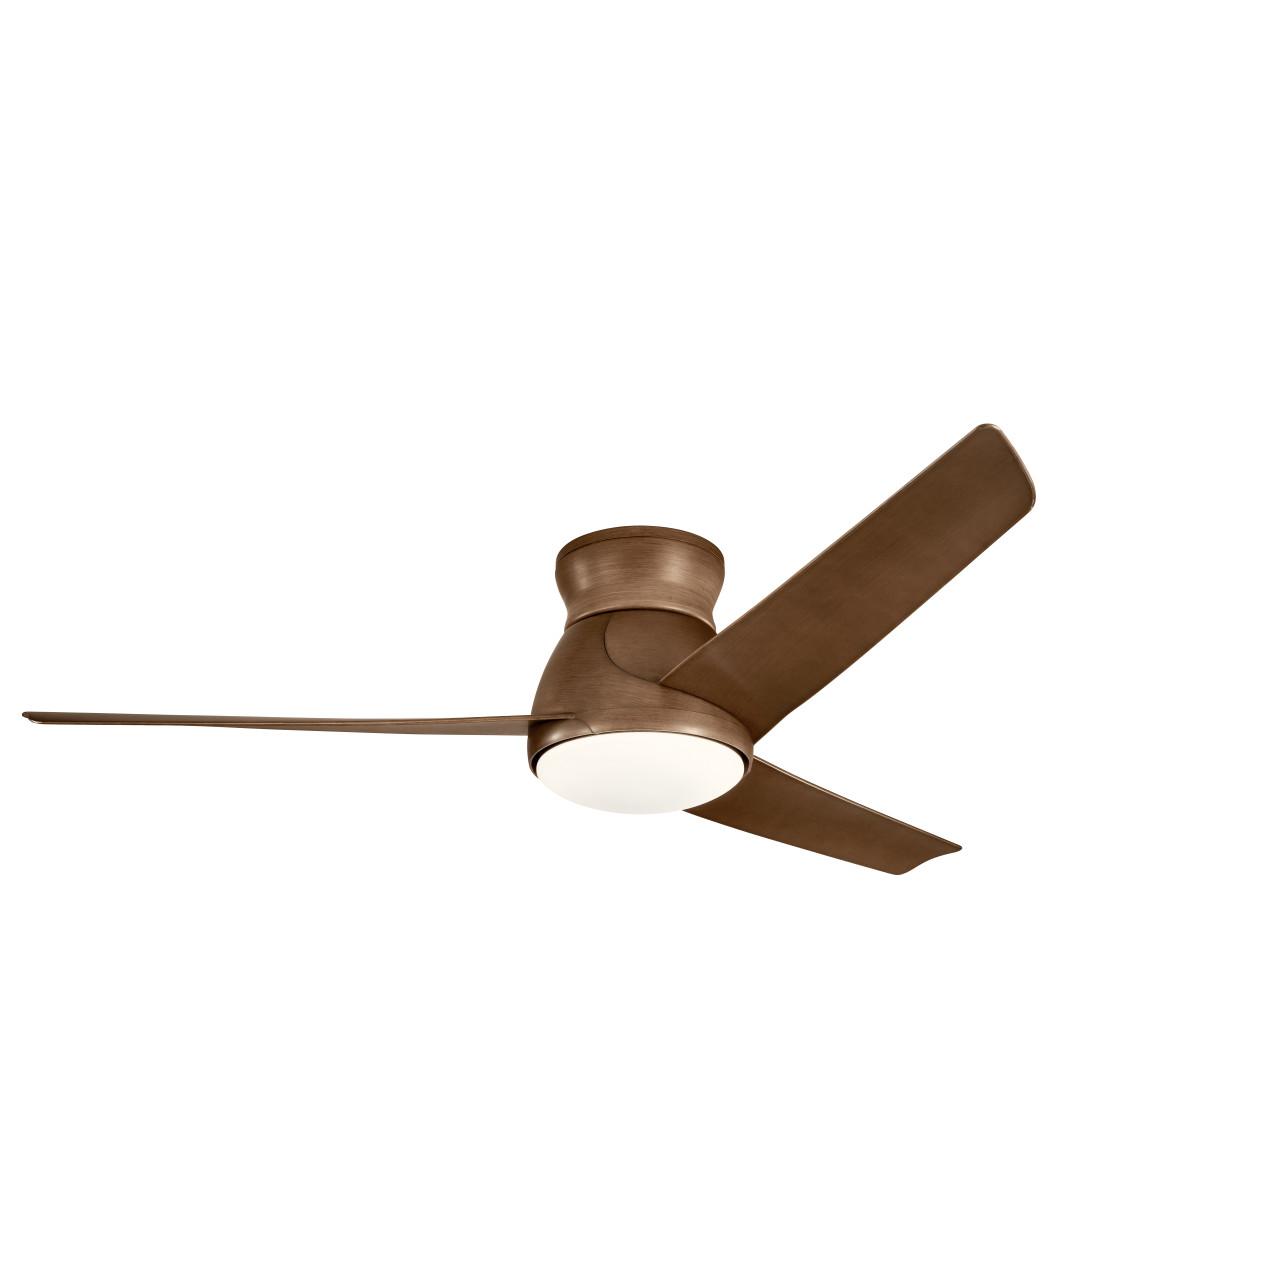 Eris 60 23w Led Walnut 3 Blade Indoor Outdoor Ceiling Fan By Kichler 310160wn